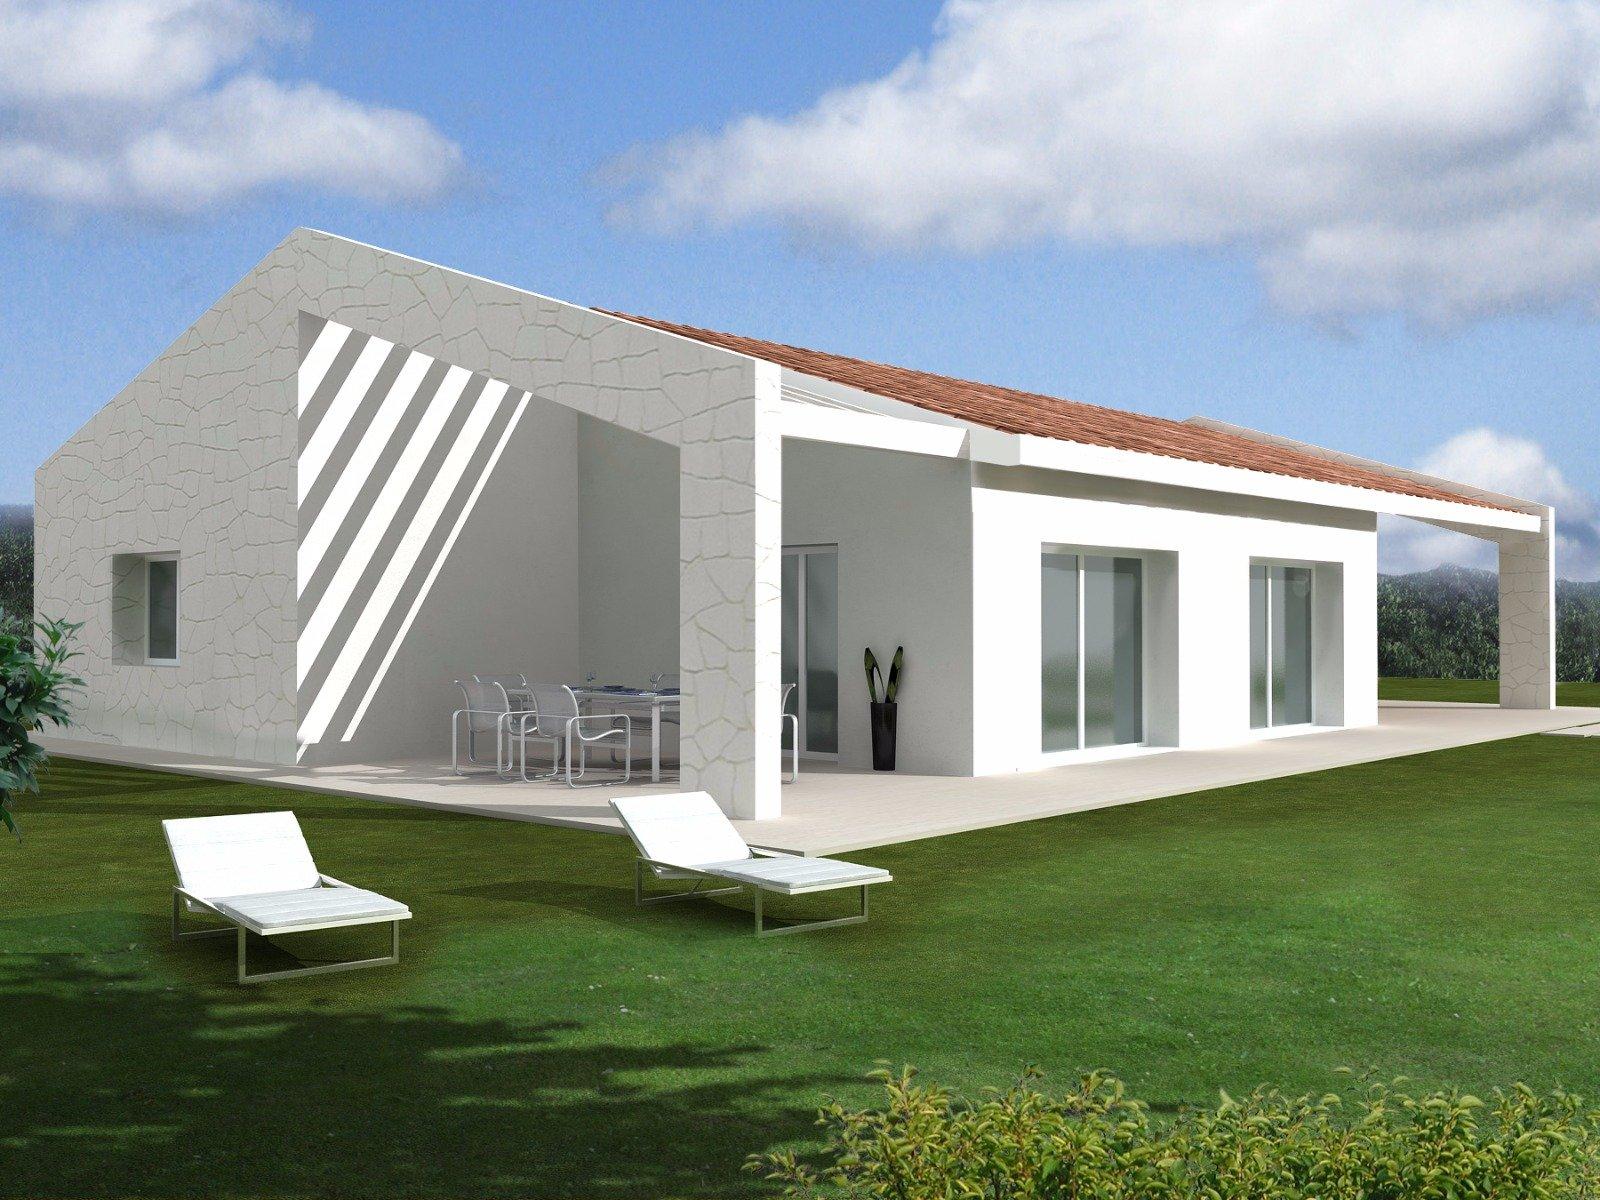 come costruire una casa ecologica